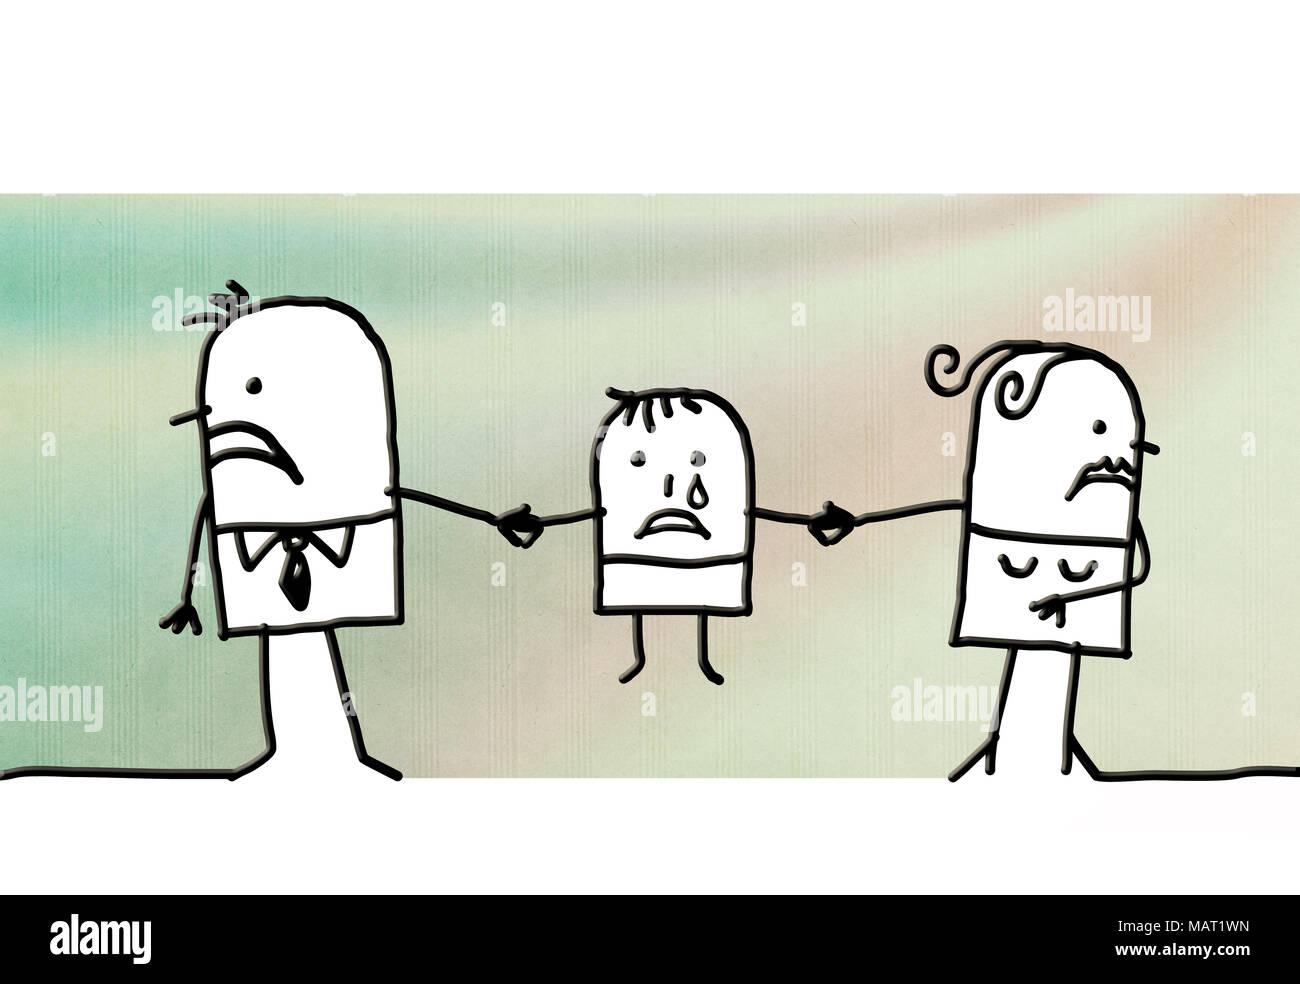 Cartoon Couple Divorcing And Sad Child Stock Photo Alamy